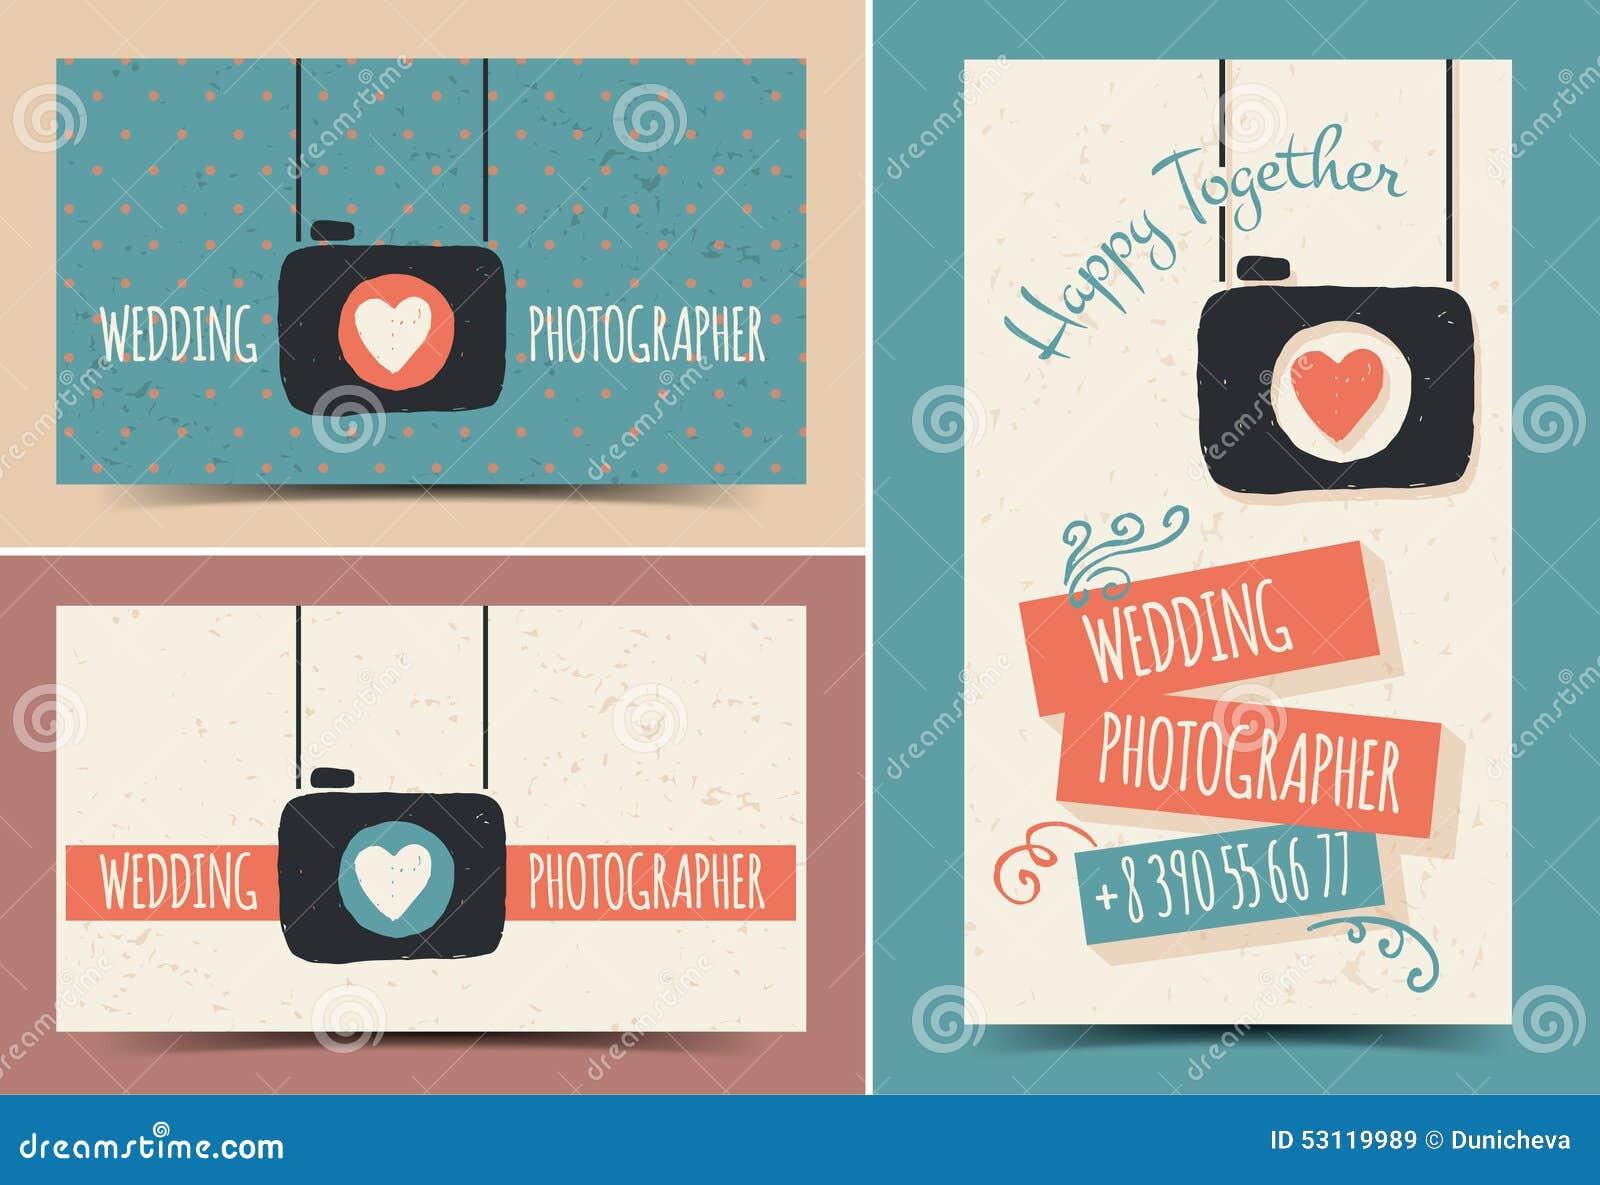 Creative Business Card Photographer Stock Illustration ...